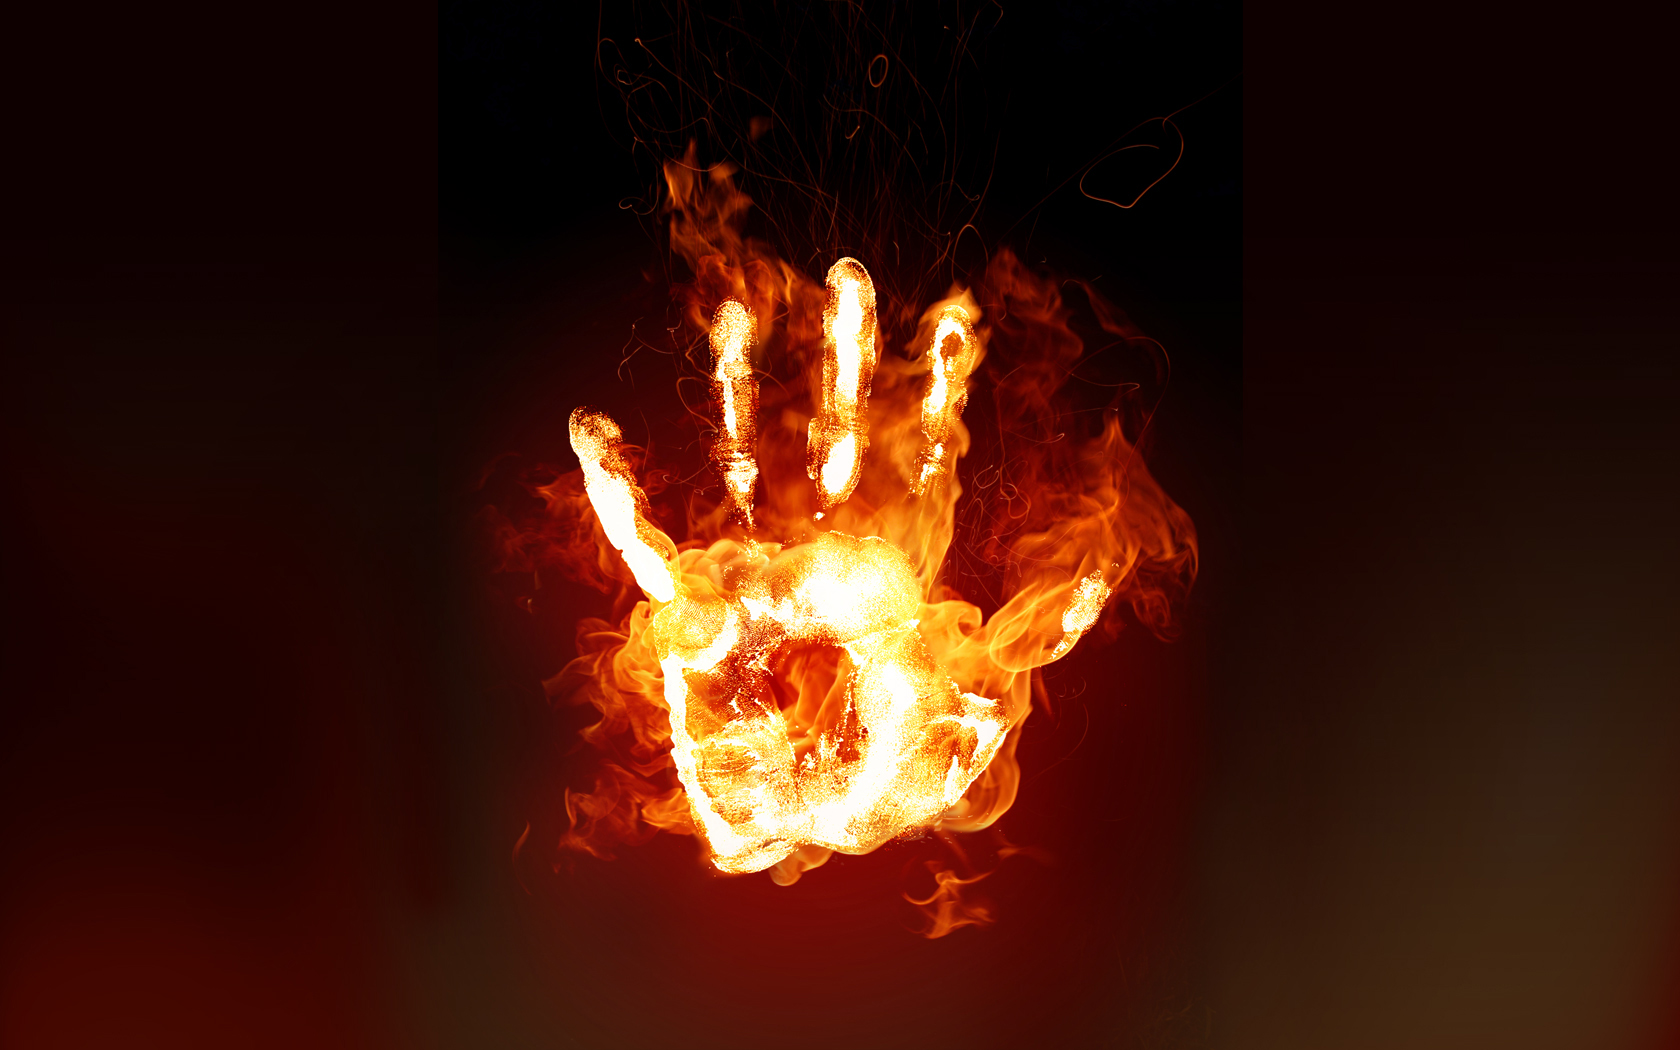 Dark - Artistic  Fire Hand Dark Flame Wallpaper